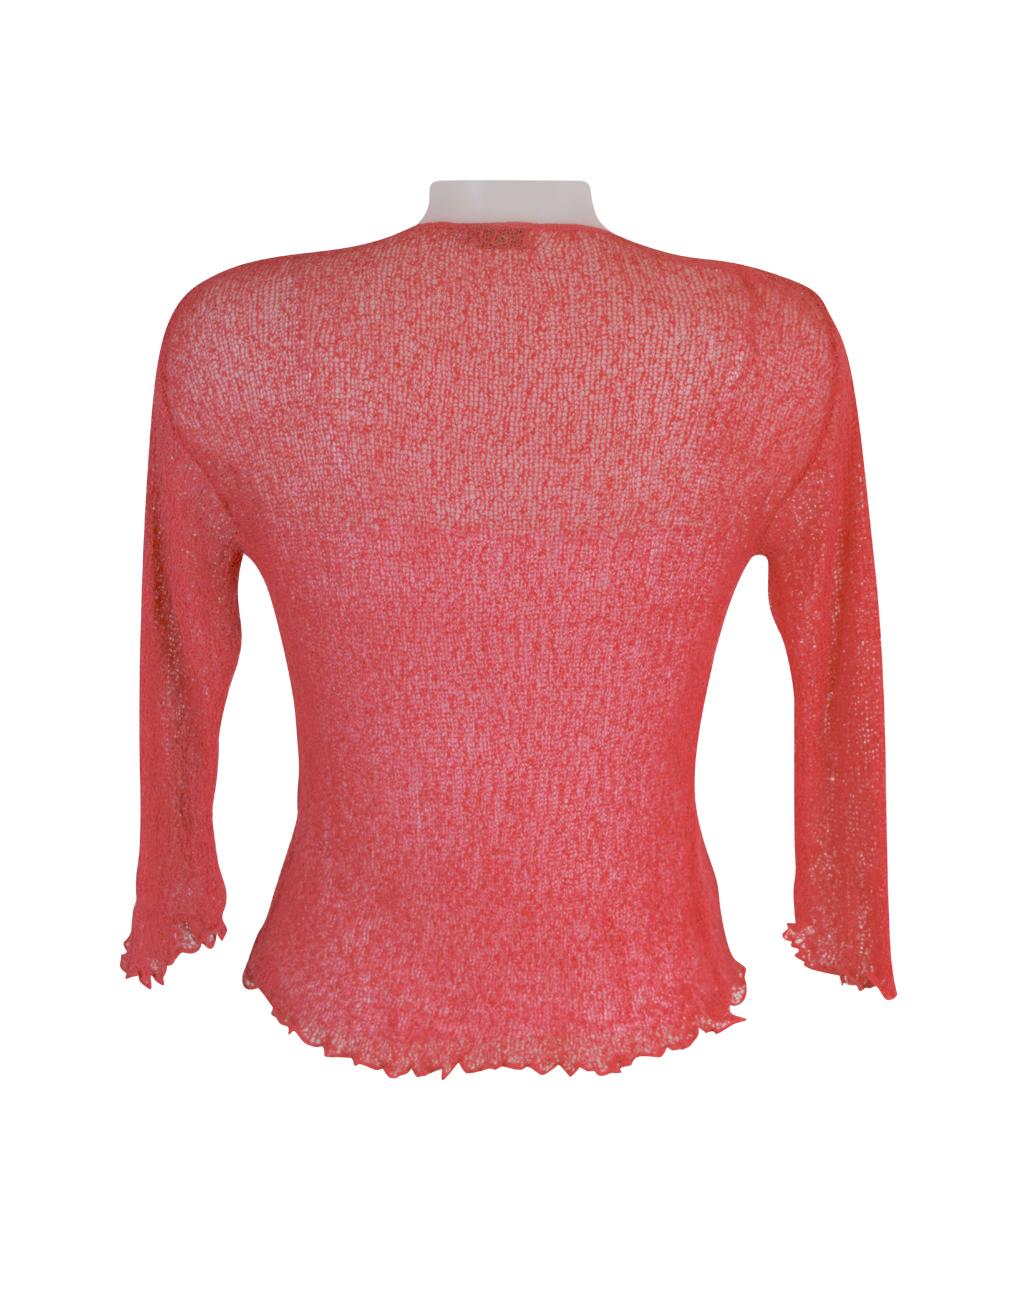 Coral net cardigan back